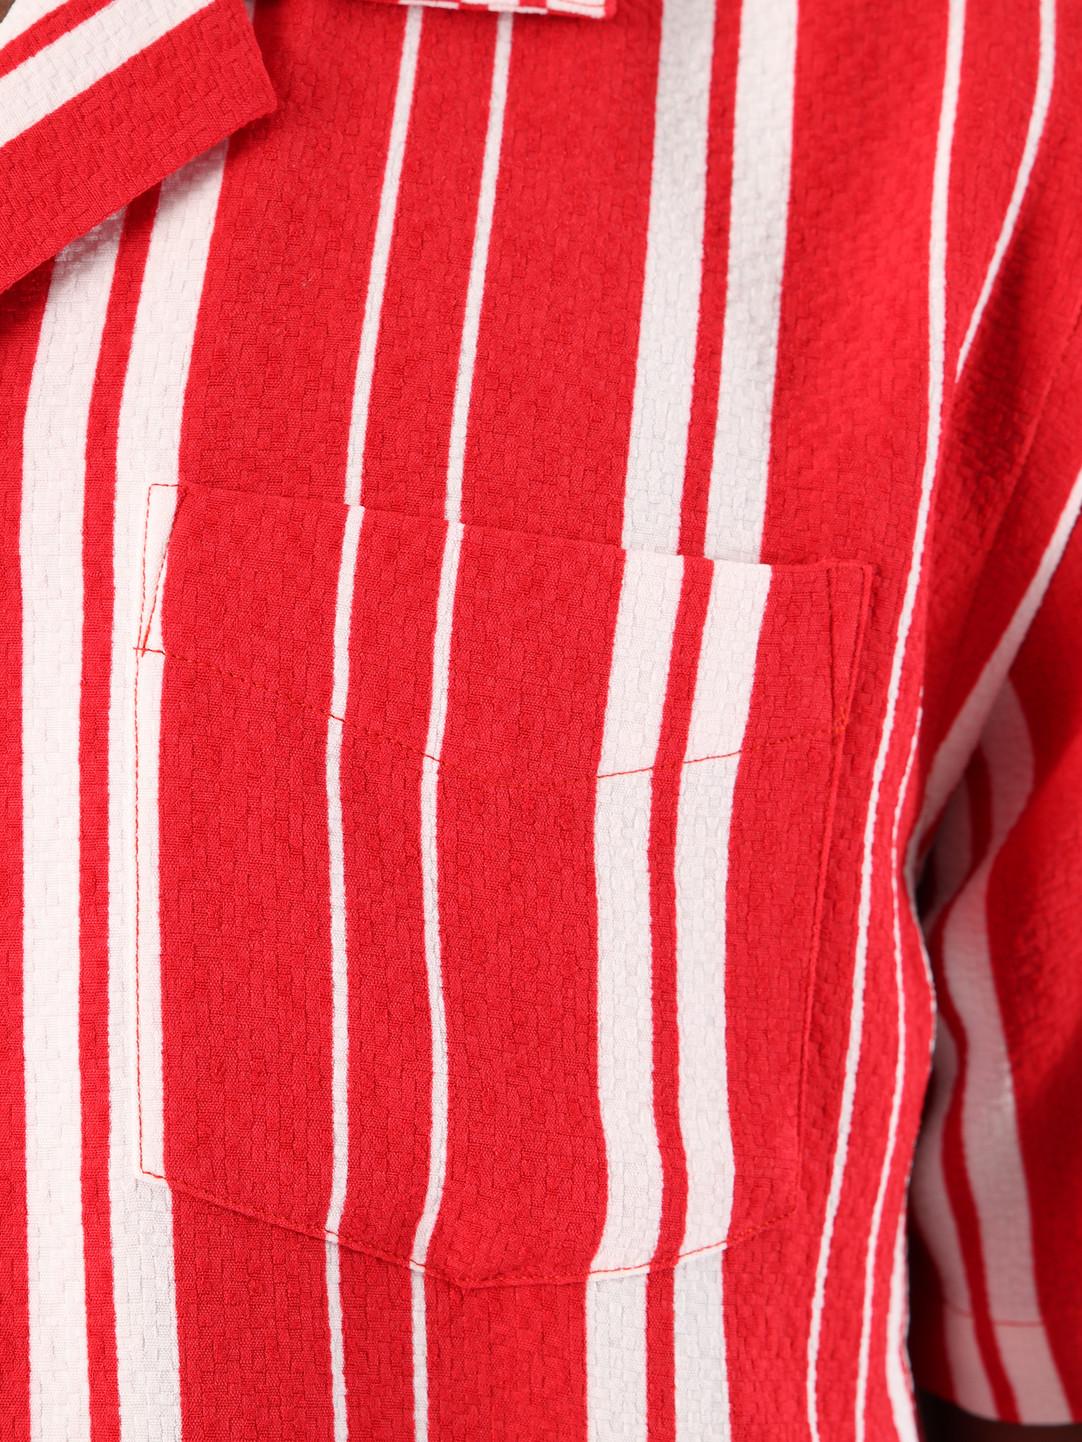 Libertine Libertine Libertine Libertine Cave Shortsleeve Shirt Off White Formula One 1621